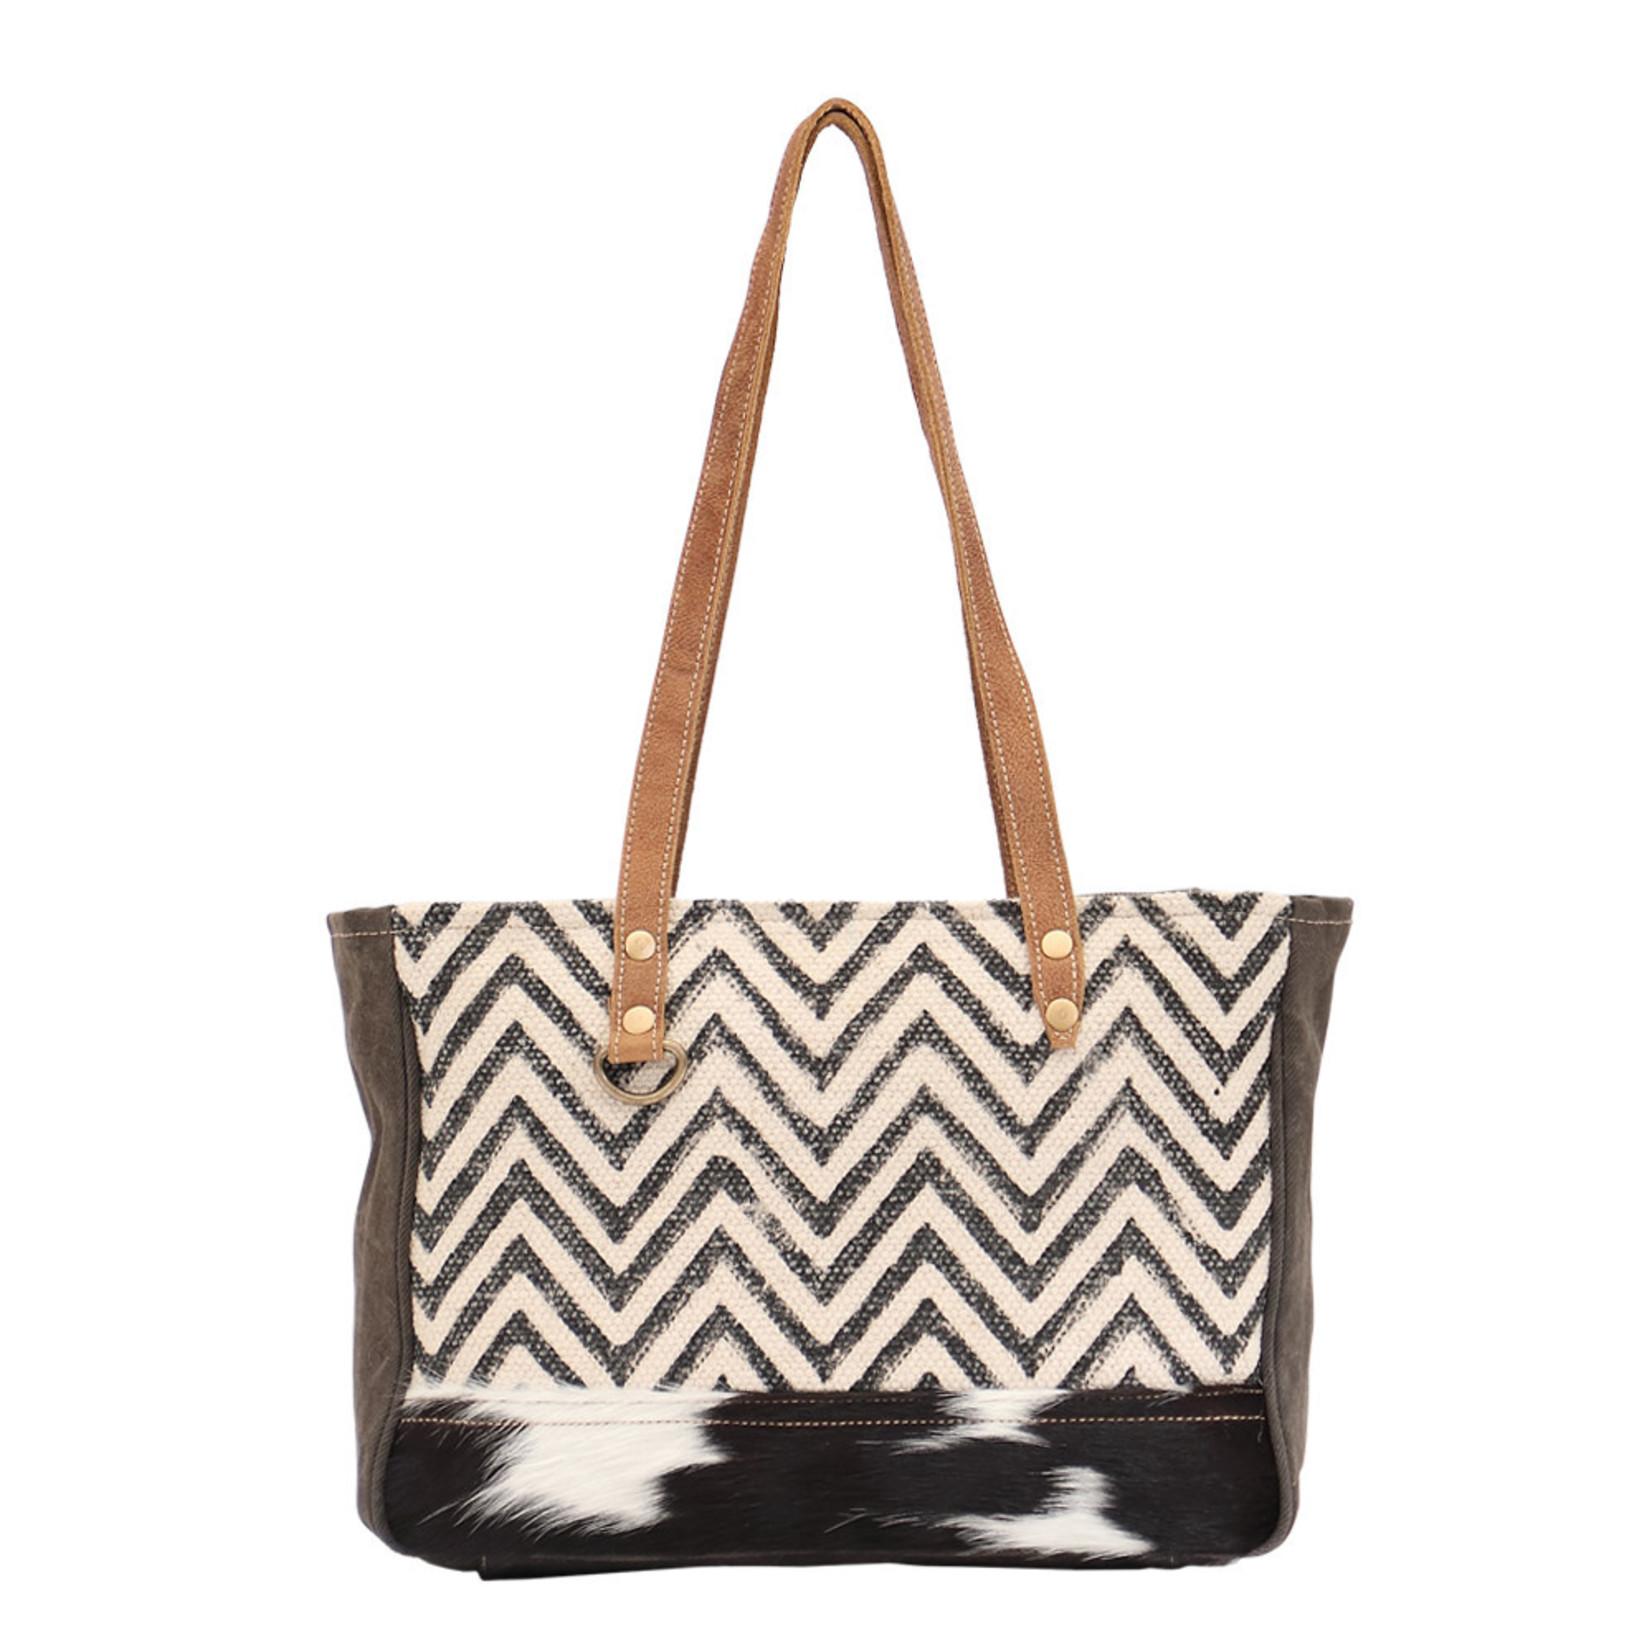 Myra Bags S-1475 Blaze Small Bag